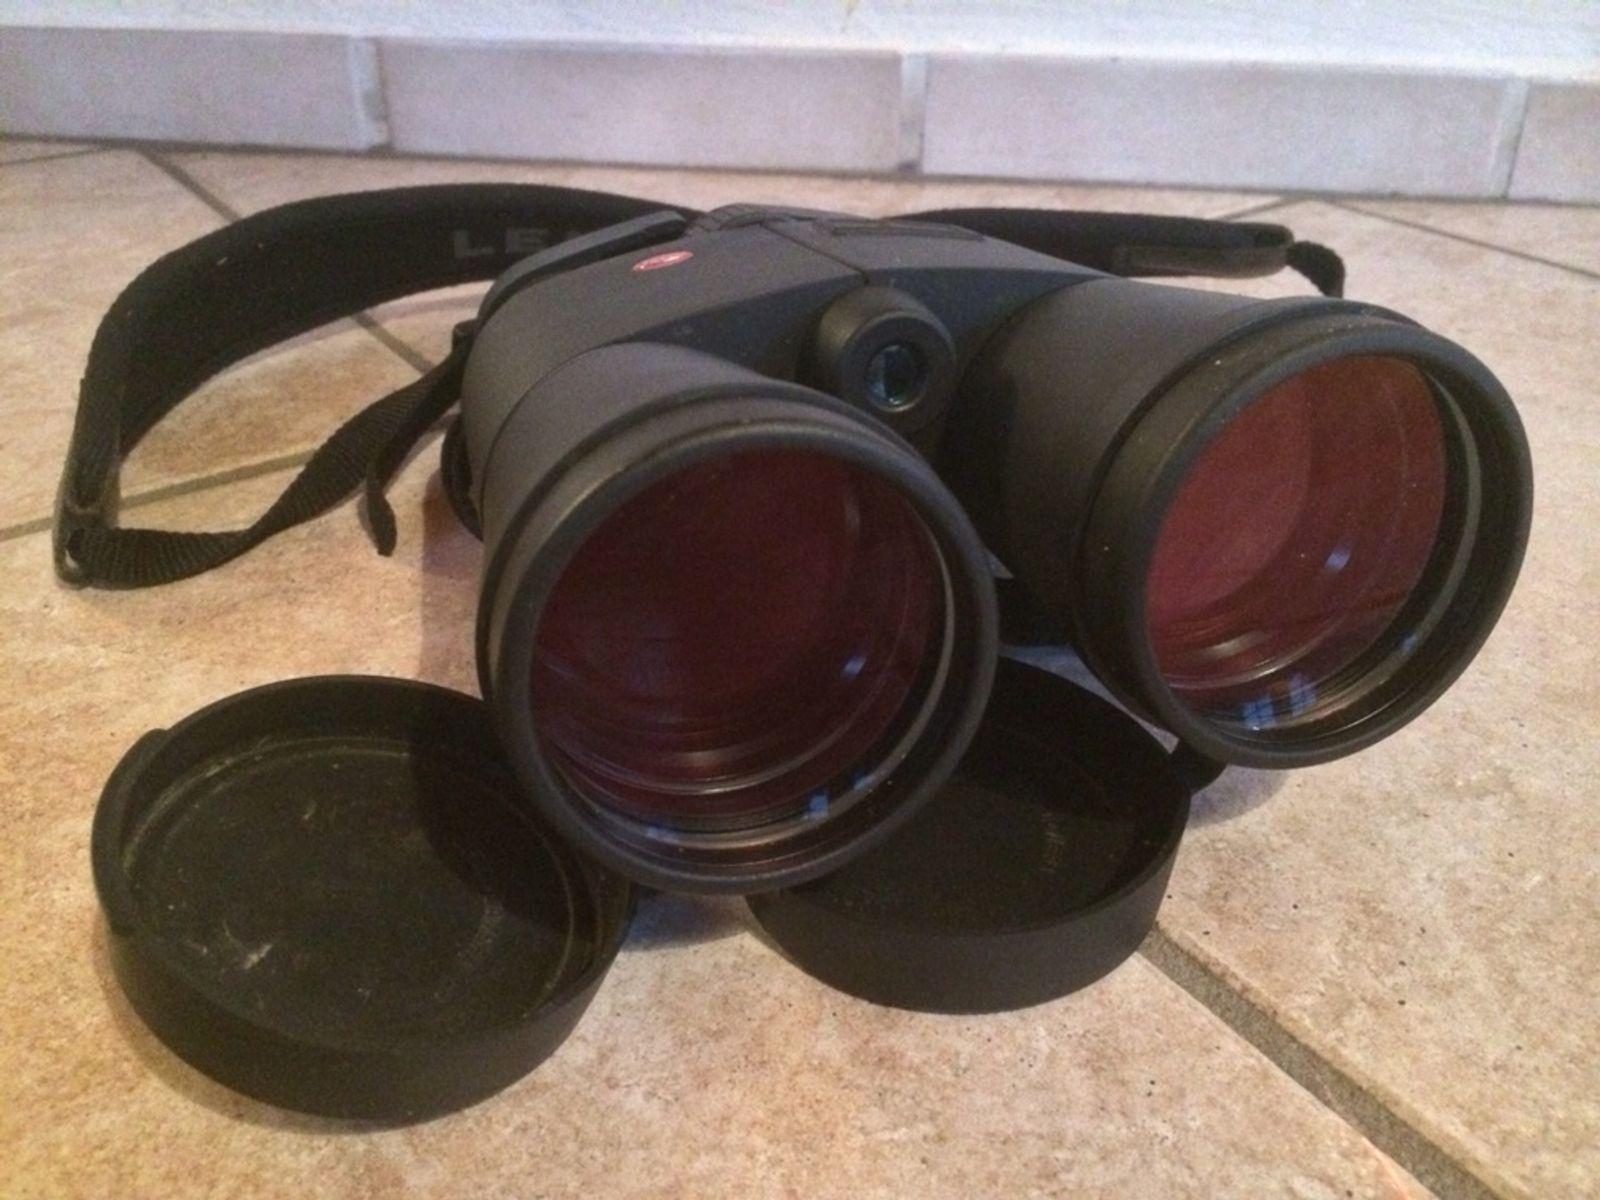 Leica fernglas entfernungsmesser fernglas leica gebraucht